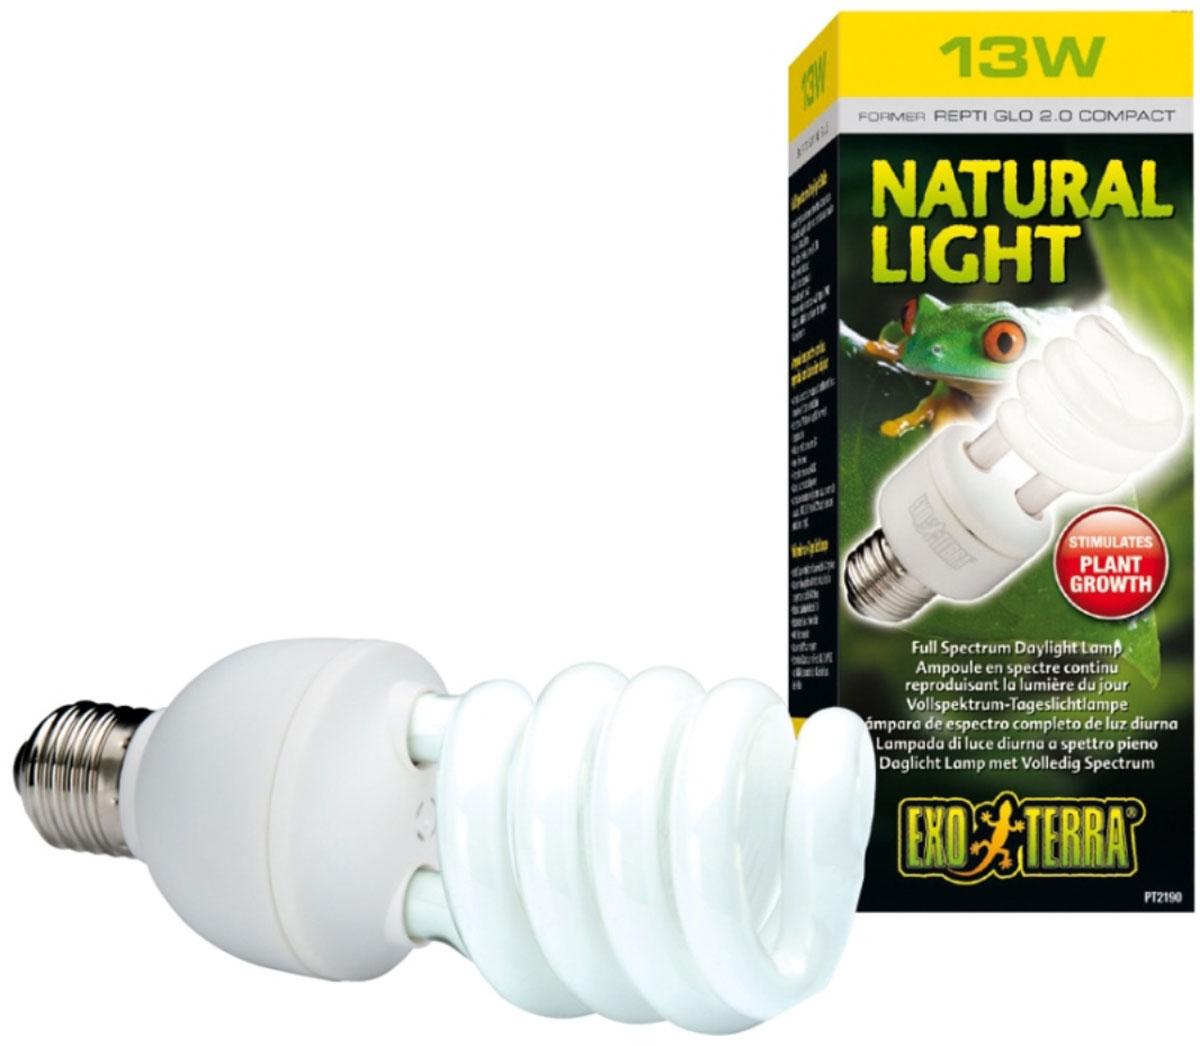 Лампа Exo Terra Лампа Repti Glo 2.0 Compact, 13 ВтPT-2190Лампа Repti Glo 2.0 Compact 13 Вт